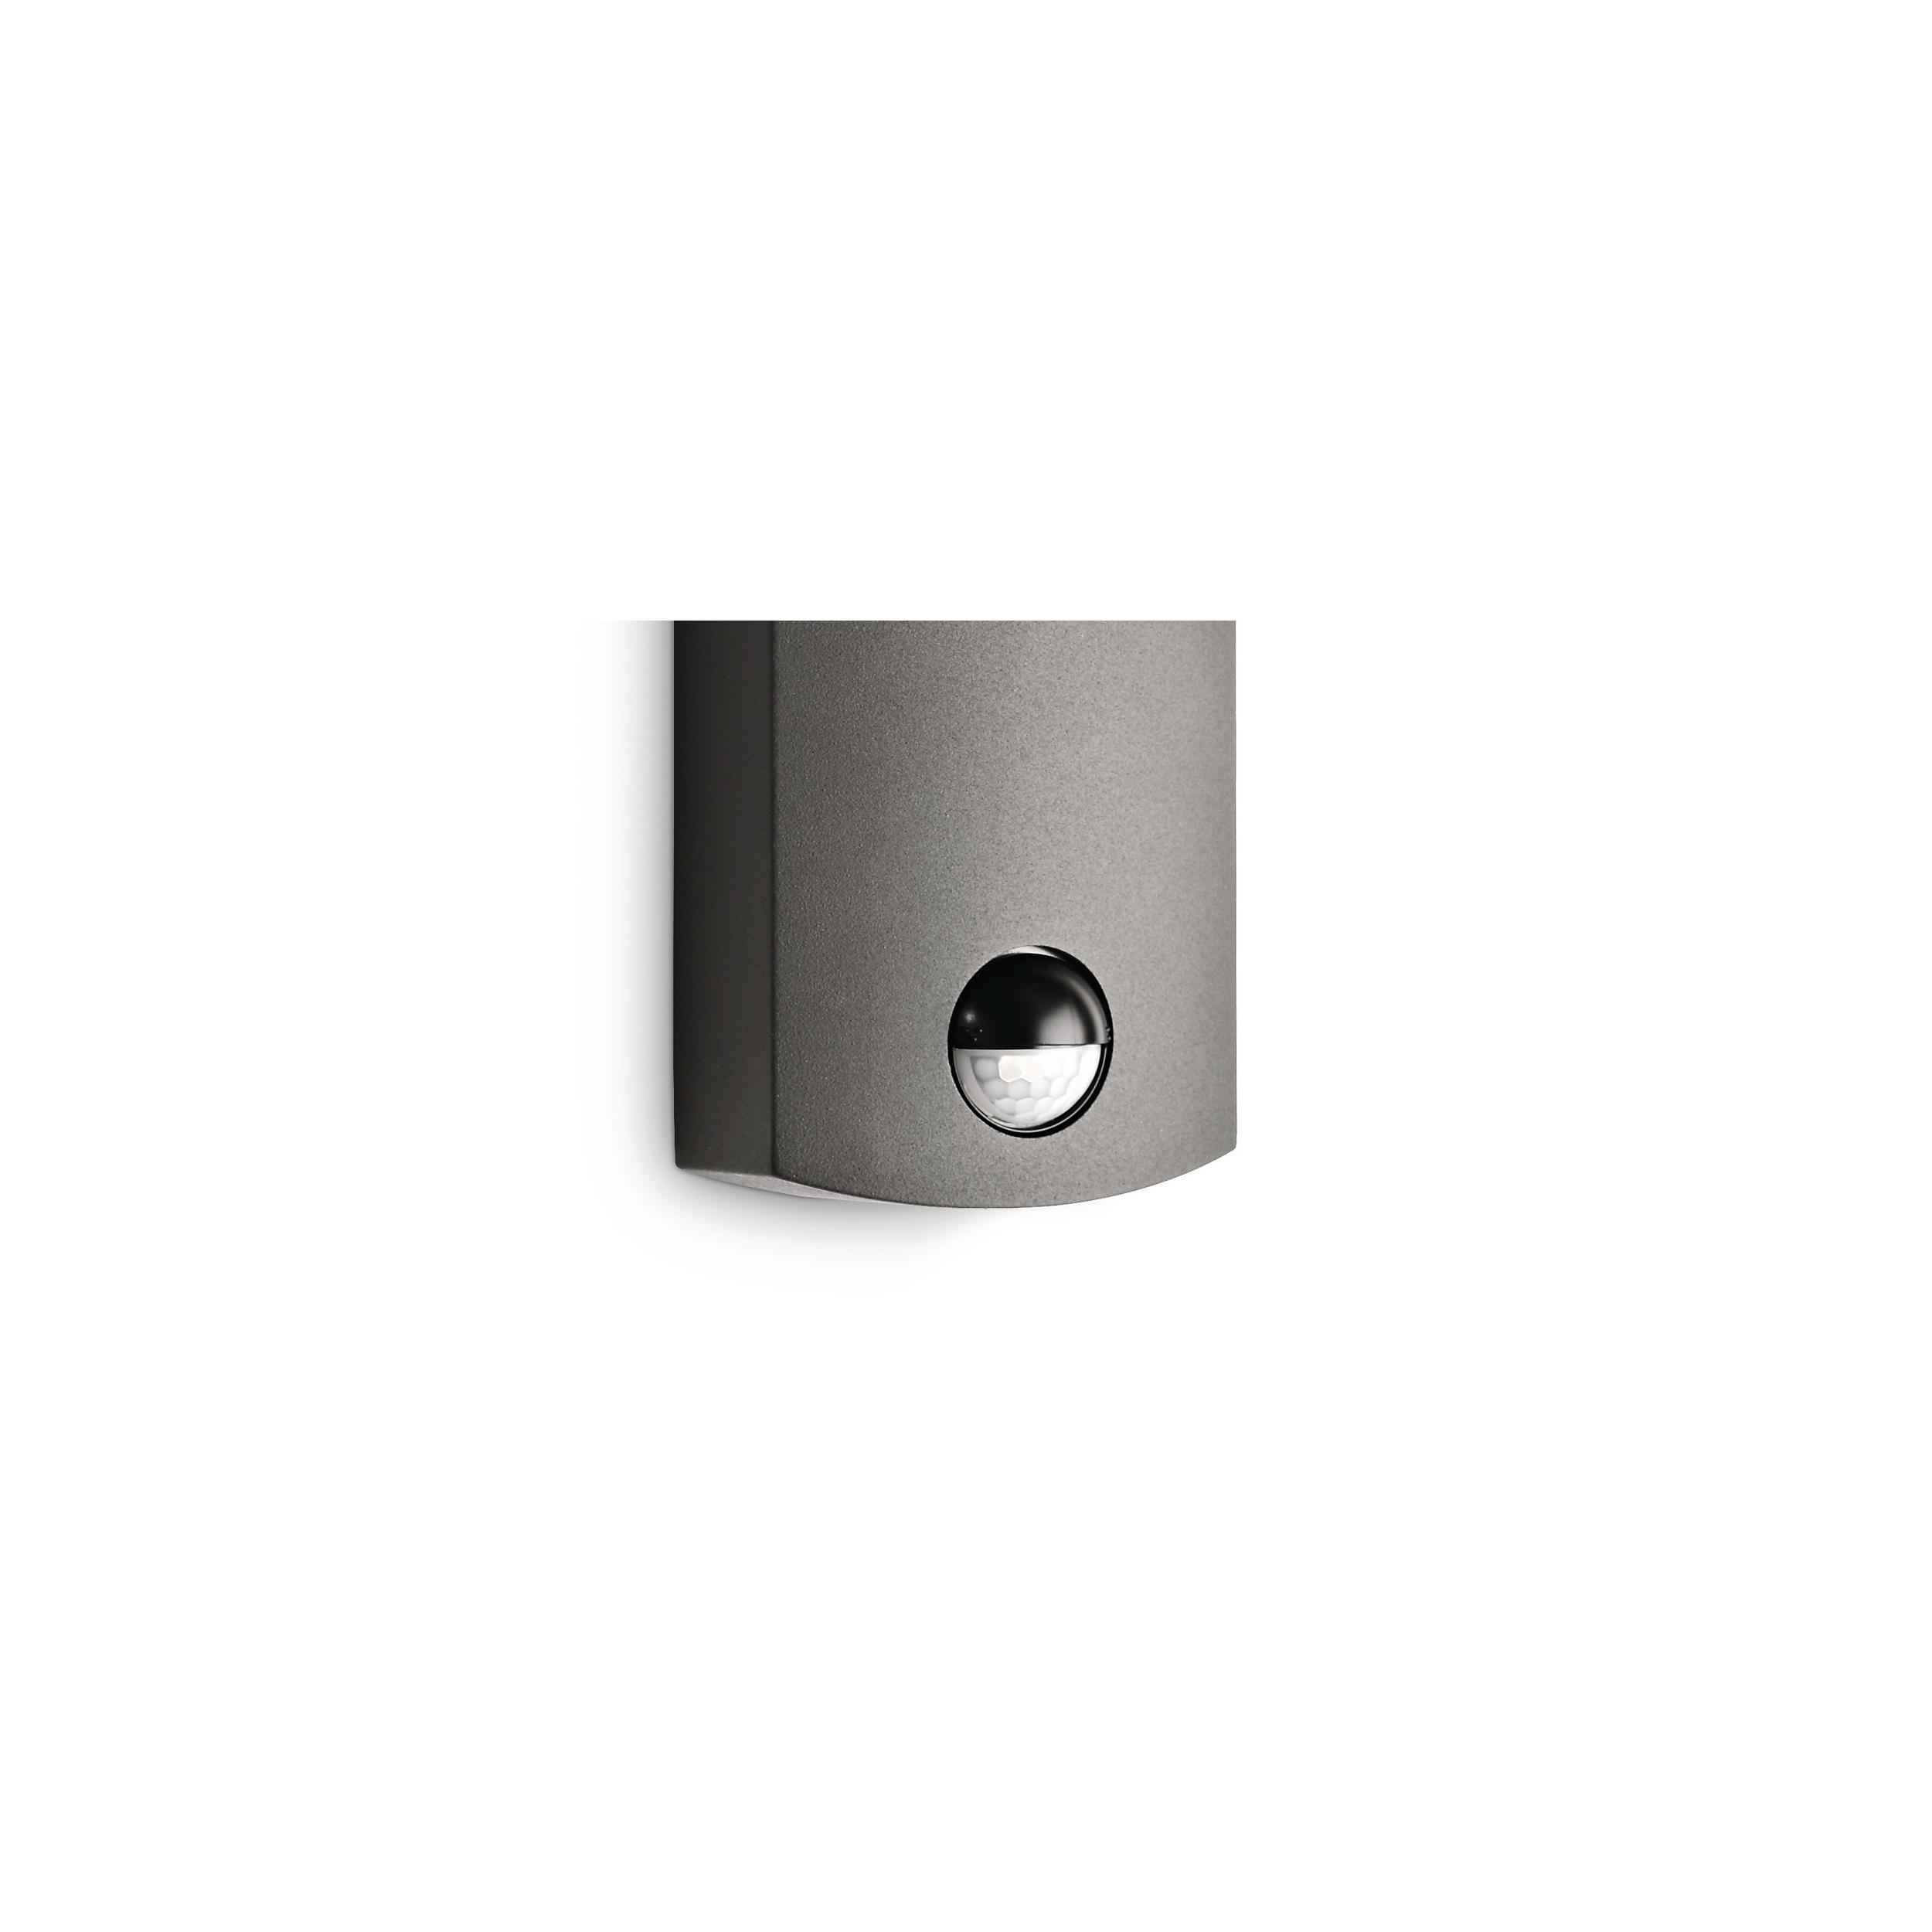 philips ledino applique murale ext rieur moderne lampe led 172399316 ebay. Black Bedroom Furniture Sets. Home Design Ideas